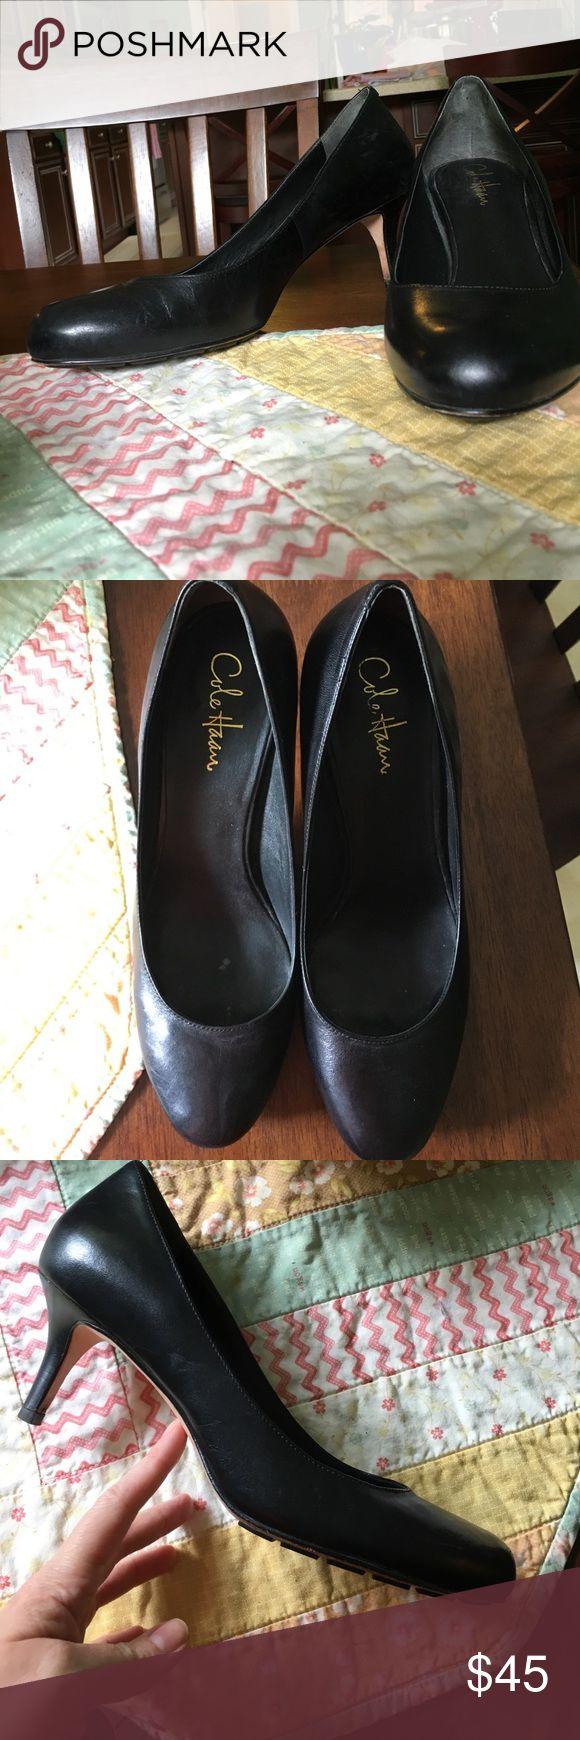 Cole Haan Nike Air black pumps sz 9.5 black euc Great basic pump from Cole Haan with Nike Air Cole Haan Shoes Heels